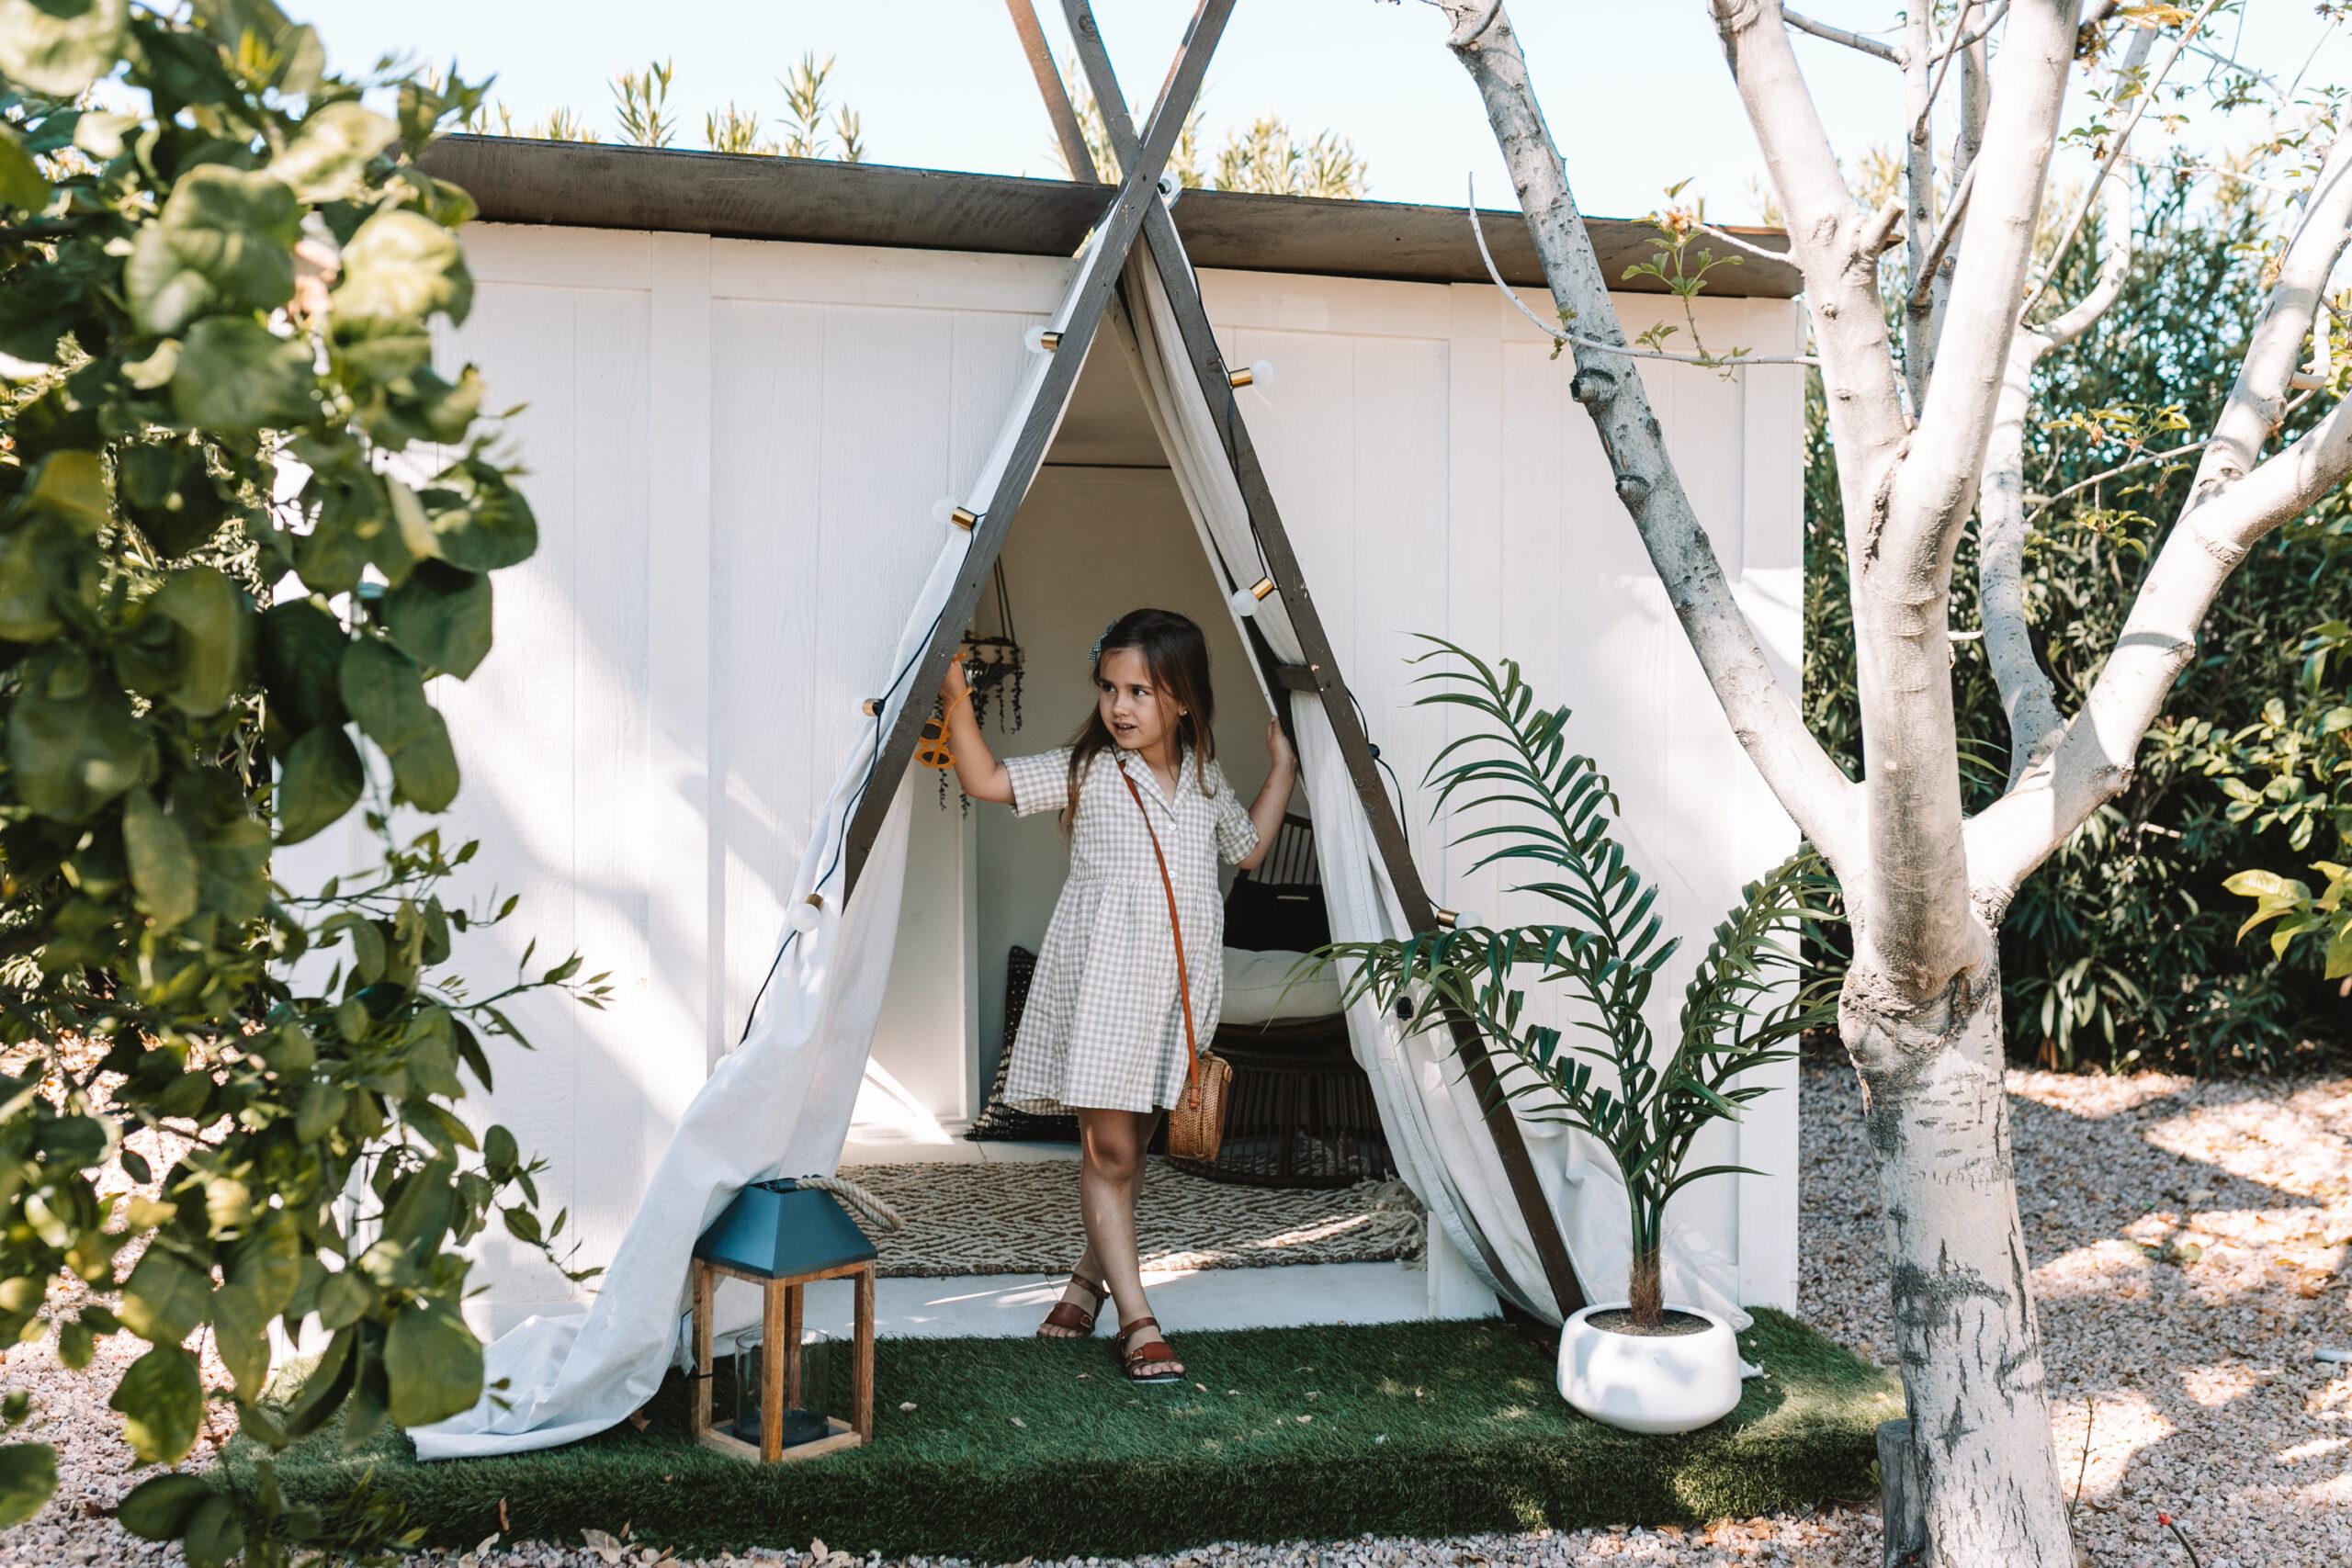 the kid's backyard clubhouse is on the blog! thelovedesignedlife.com #thelovedesignedlife #habitandhome #childsplay #kidsplayhouse